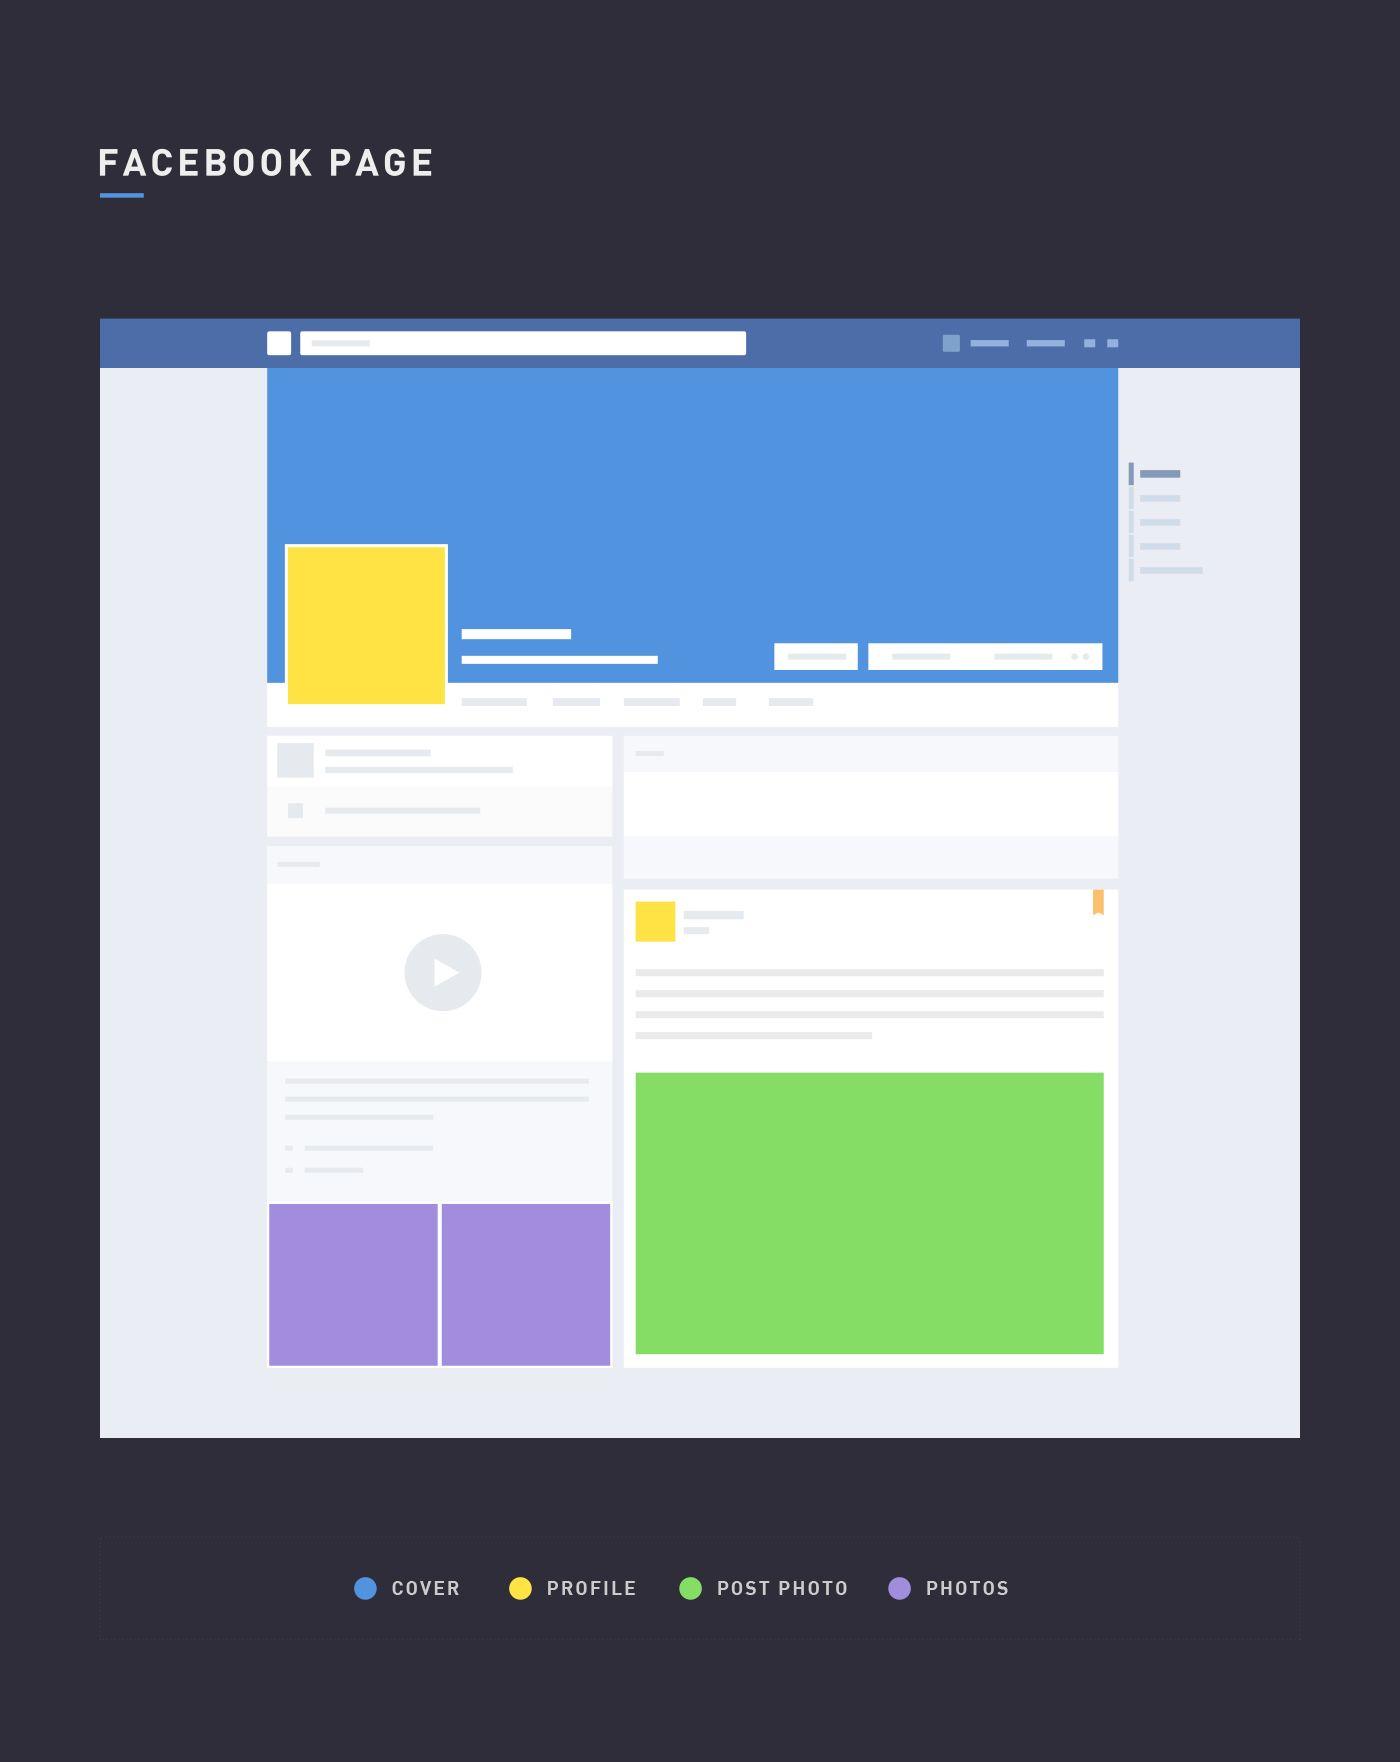 Free Facebook Page Mockup | Graphics | Pinterest | More Mockup ideas